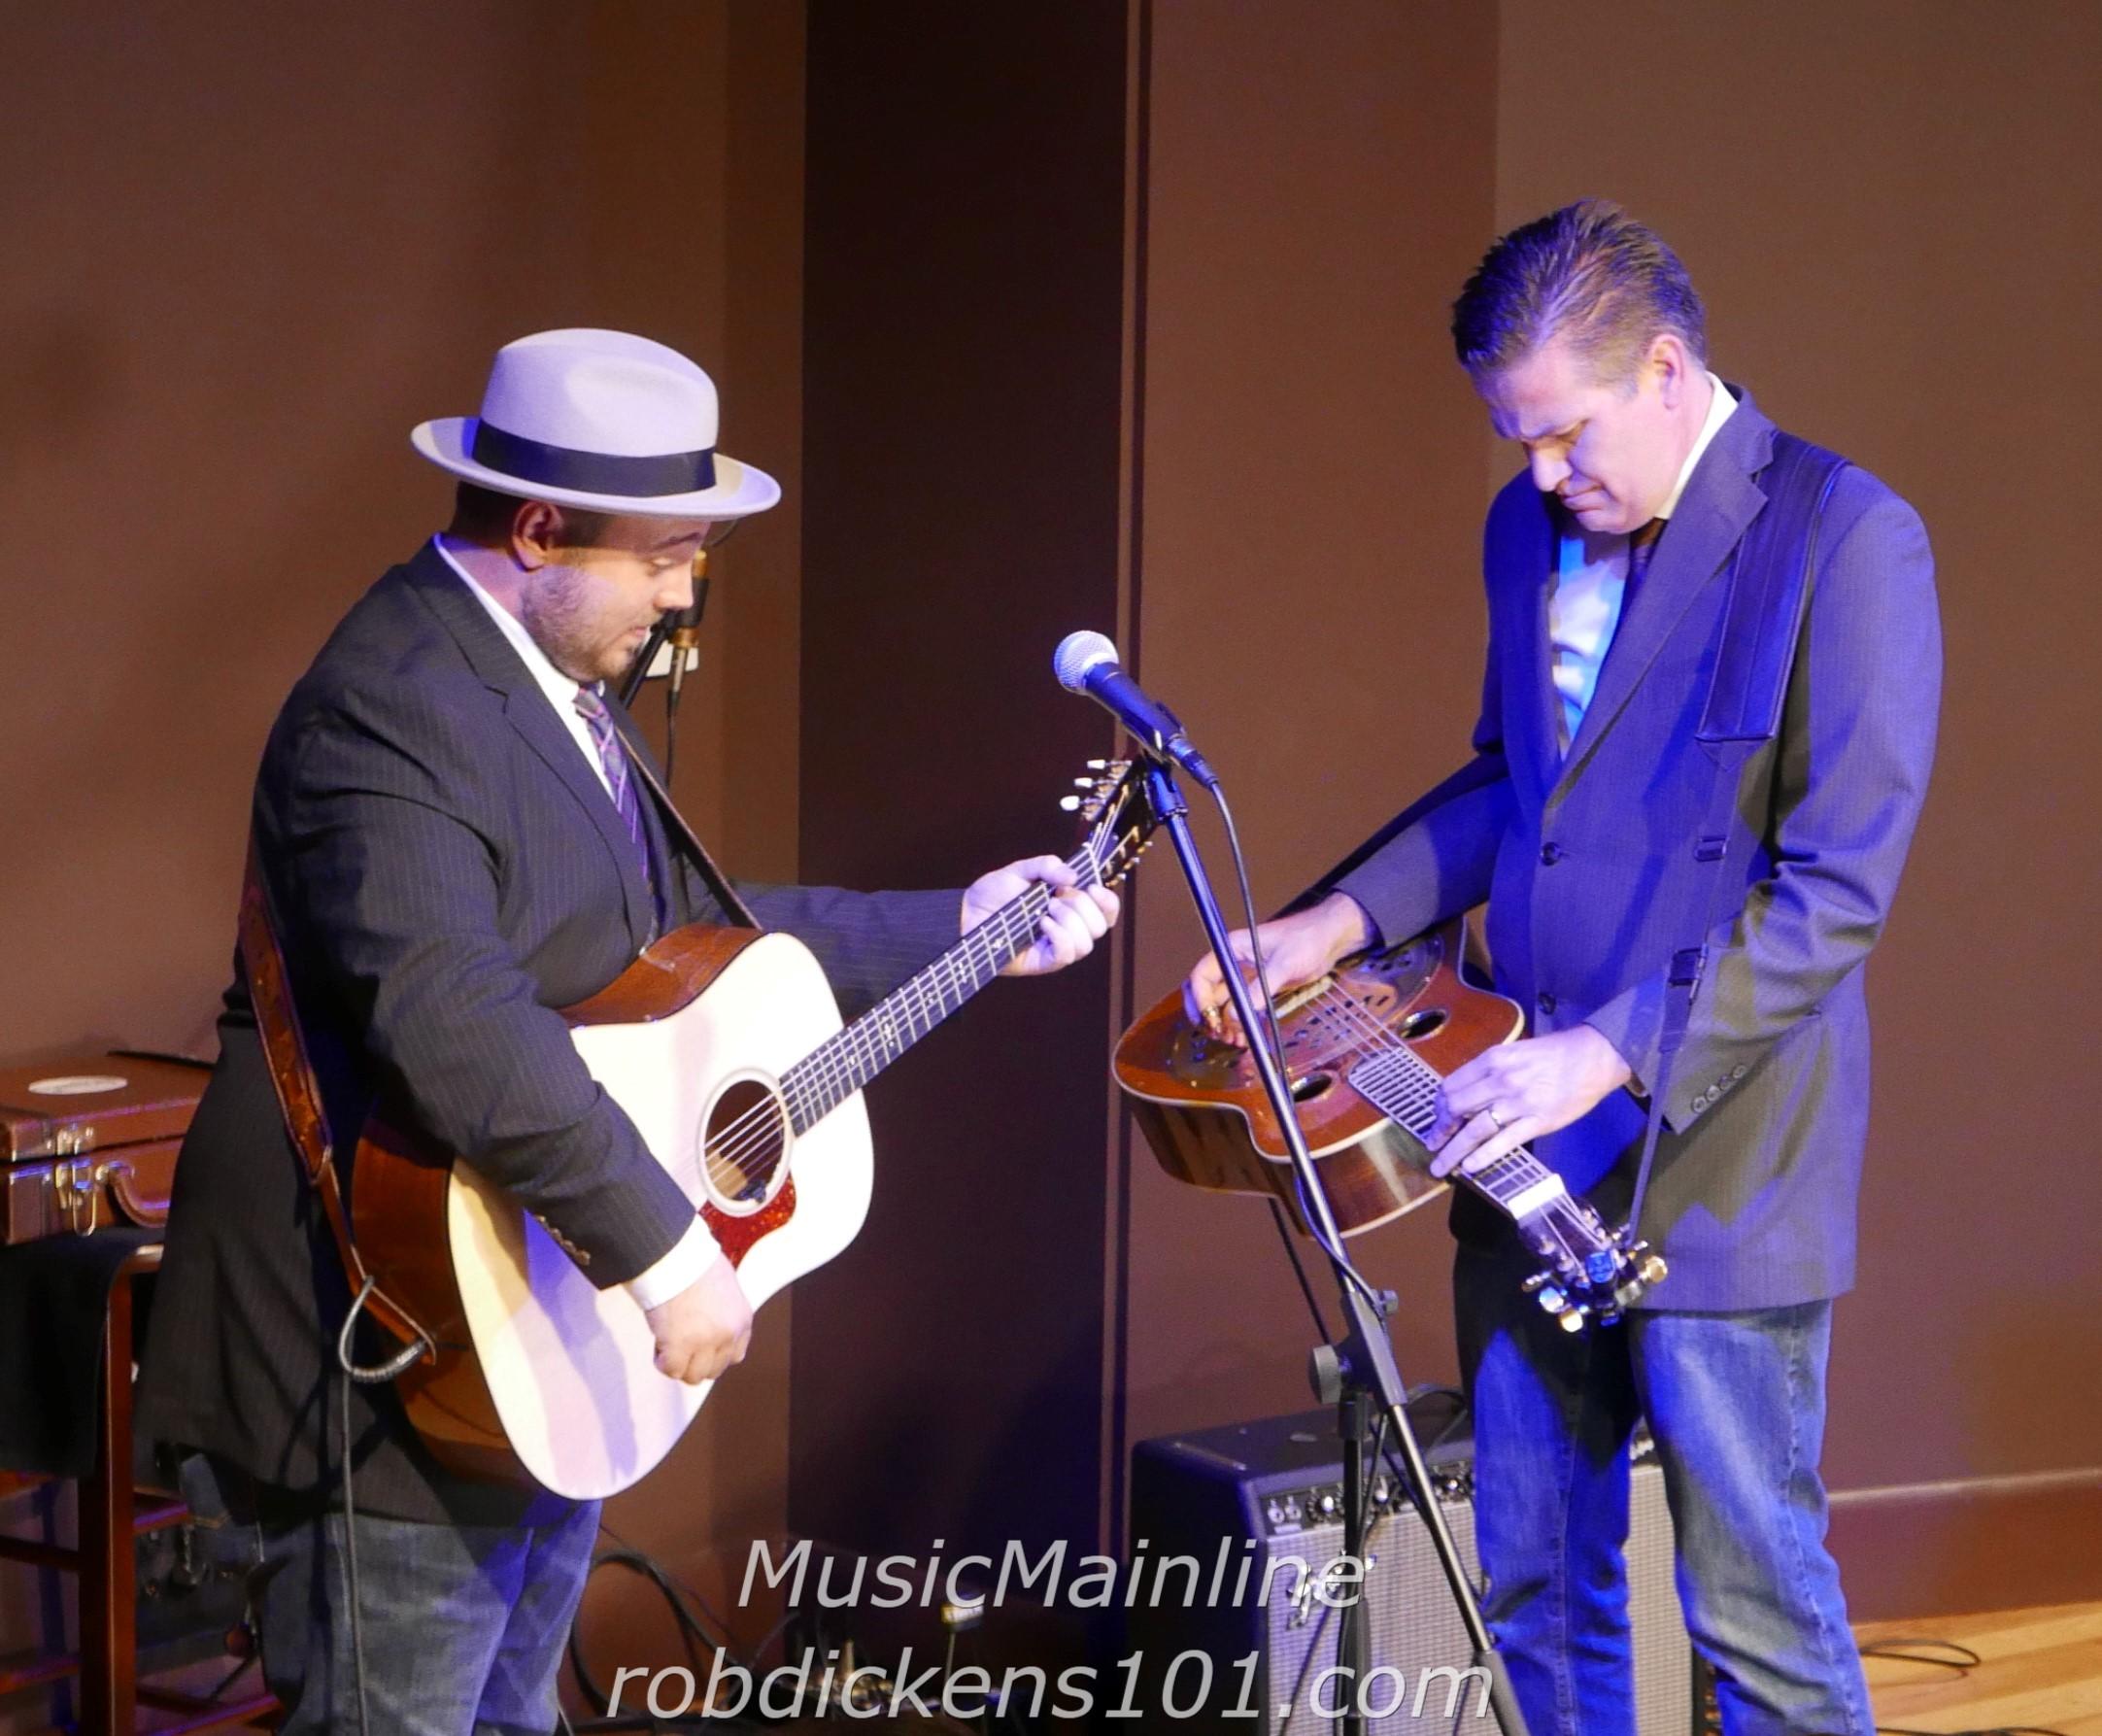 Rob Ickes and Trey Hensley Live